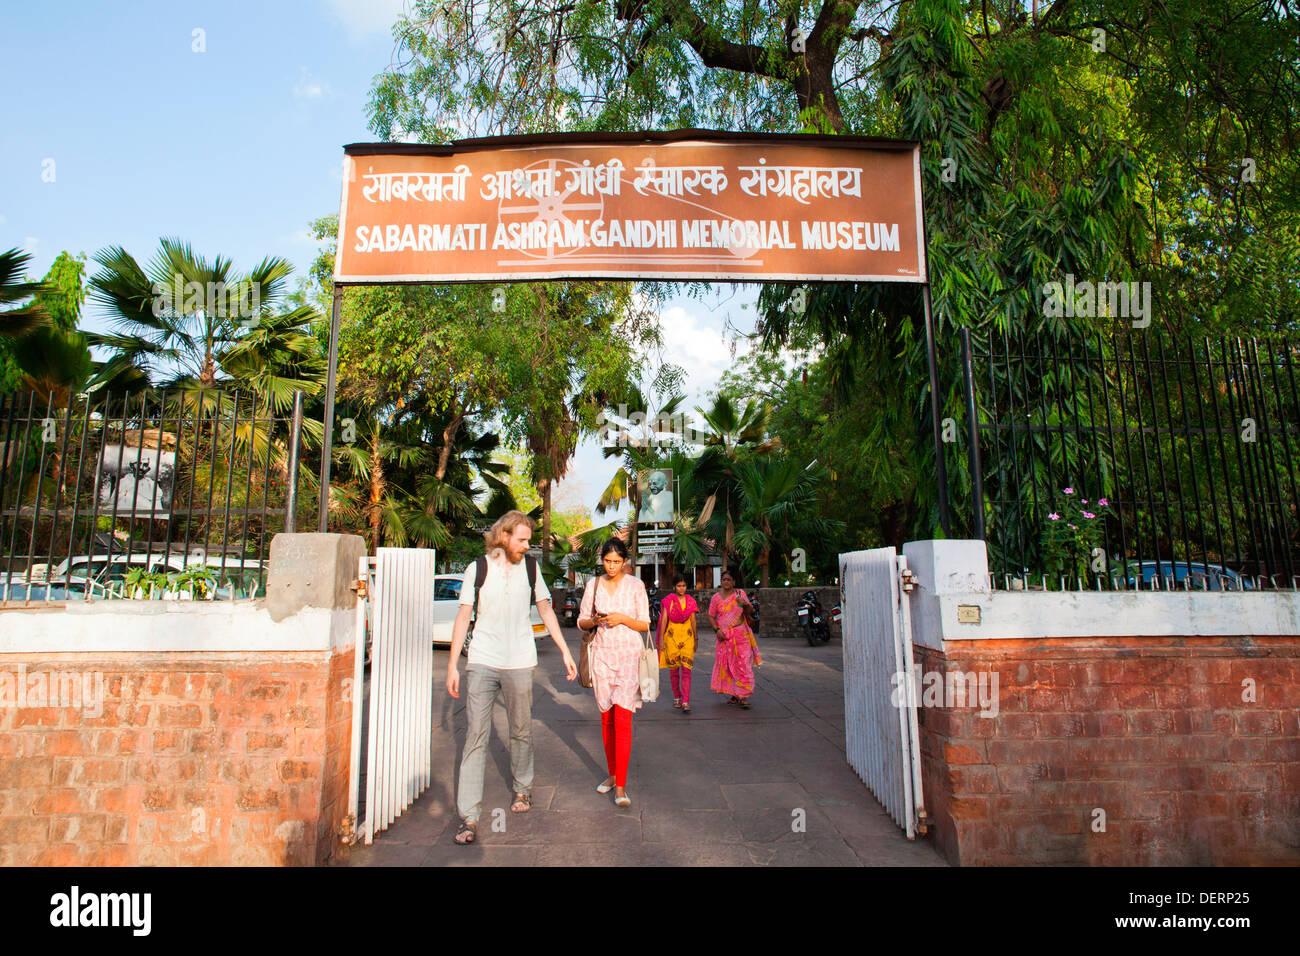 Entrance gate of a museum, Sabarmati Ashram, Ahmedabad, Gujarat, India - Stock Image